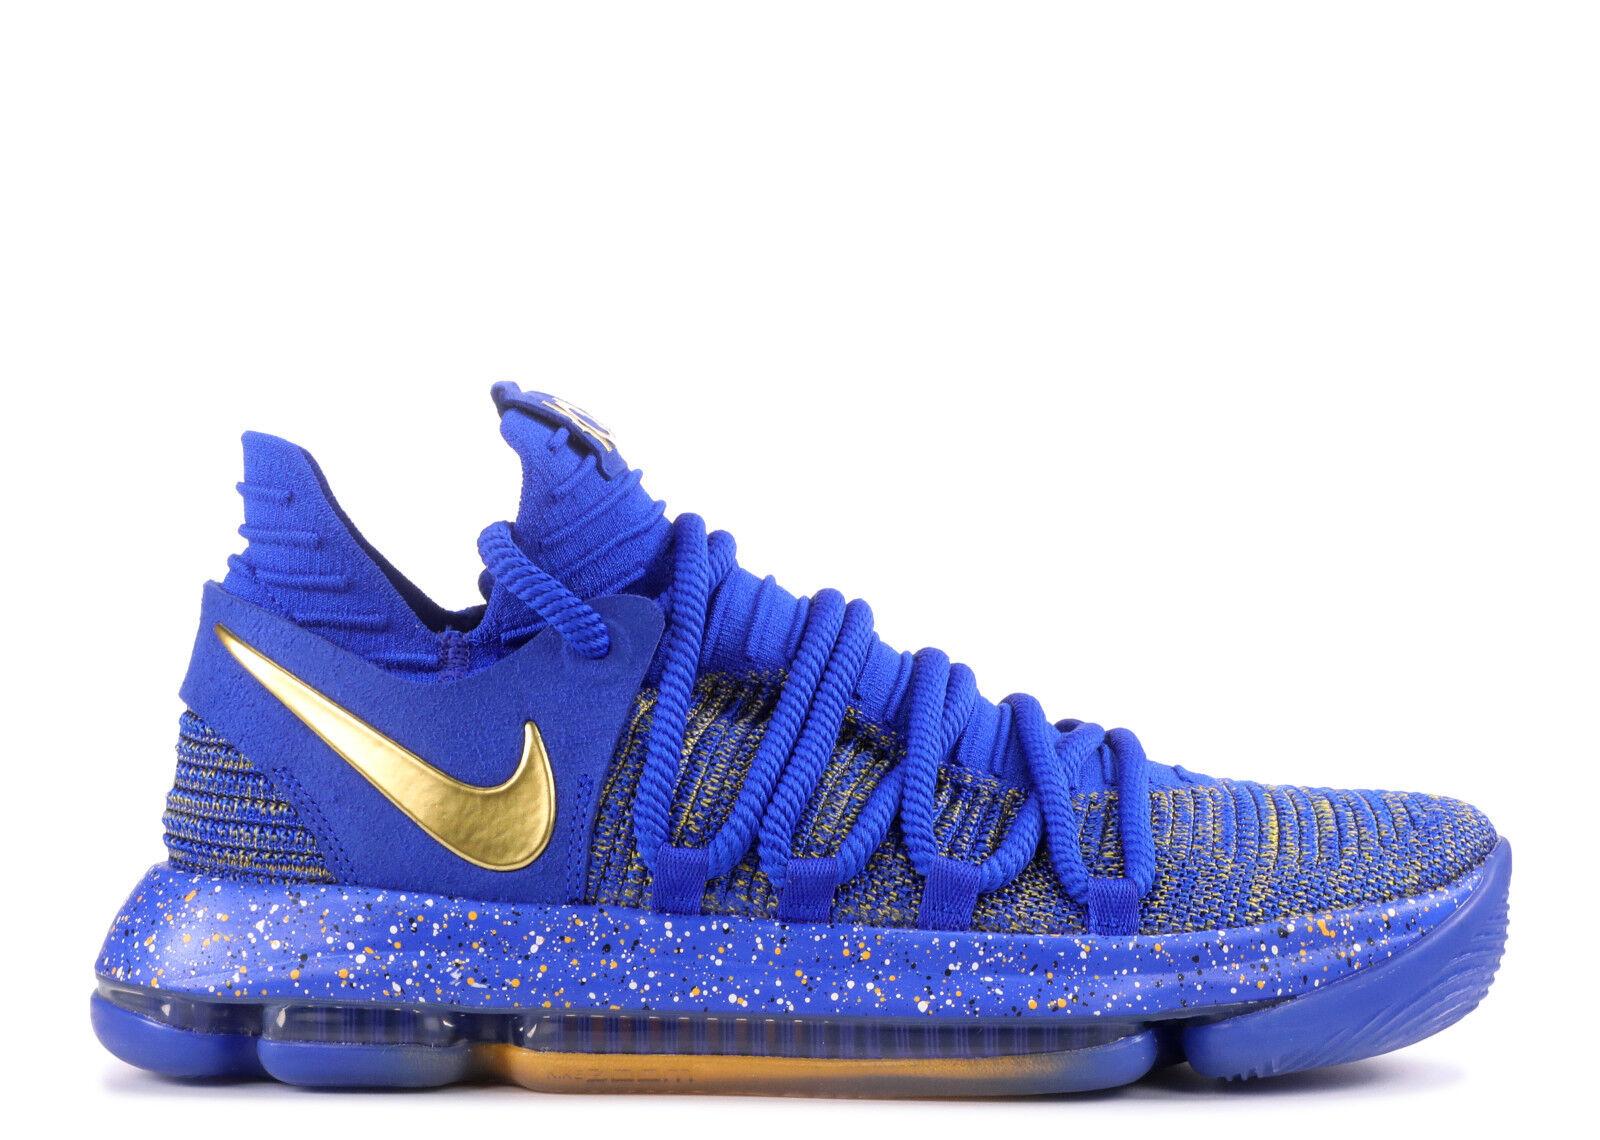 Nike KD 10 X Finals MVP golden State Warriors Size 8. 897815-403 jordan kobe